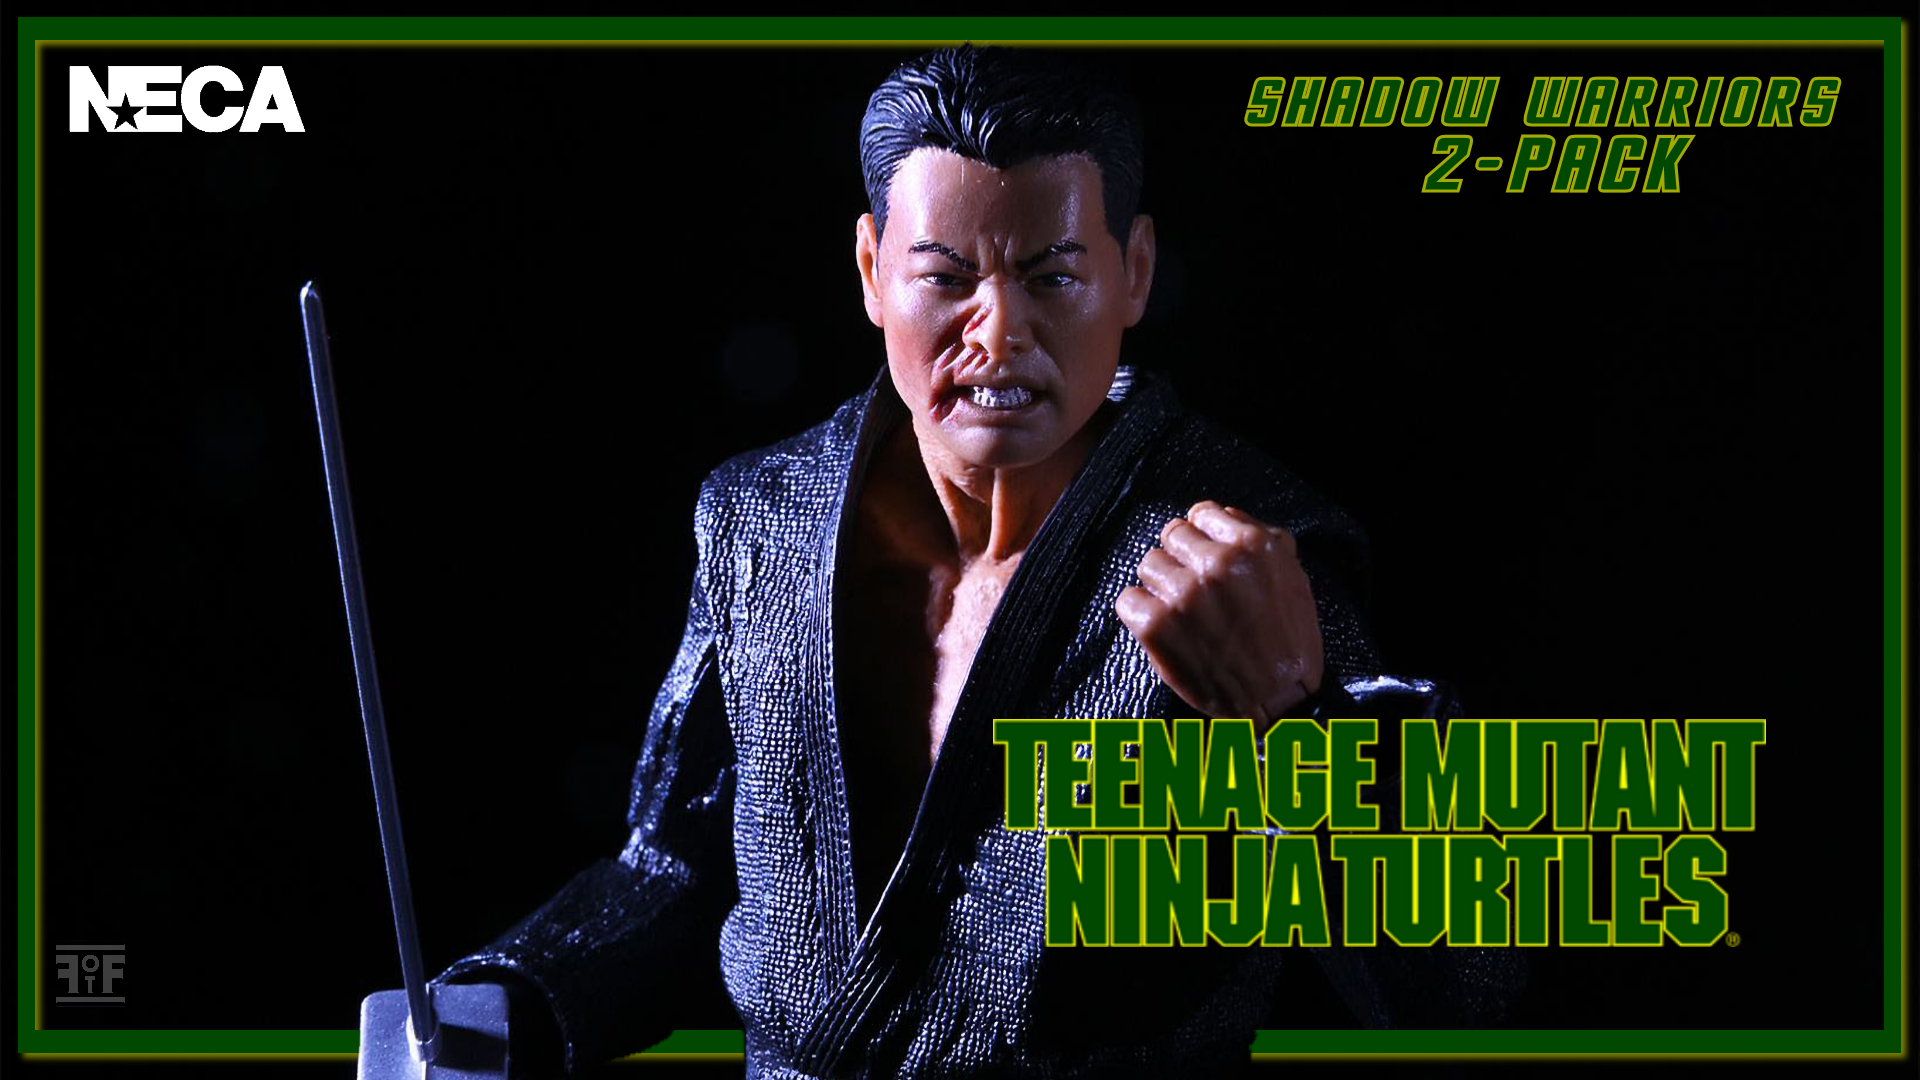 First Look | NECA Teenage Mutant Ninja Turtles 1990 'Shadow Warriors' 2-Pack